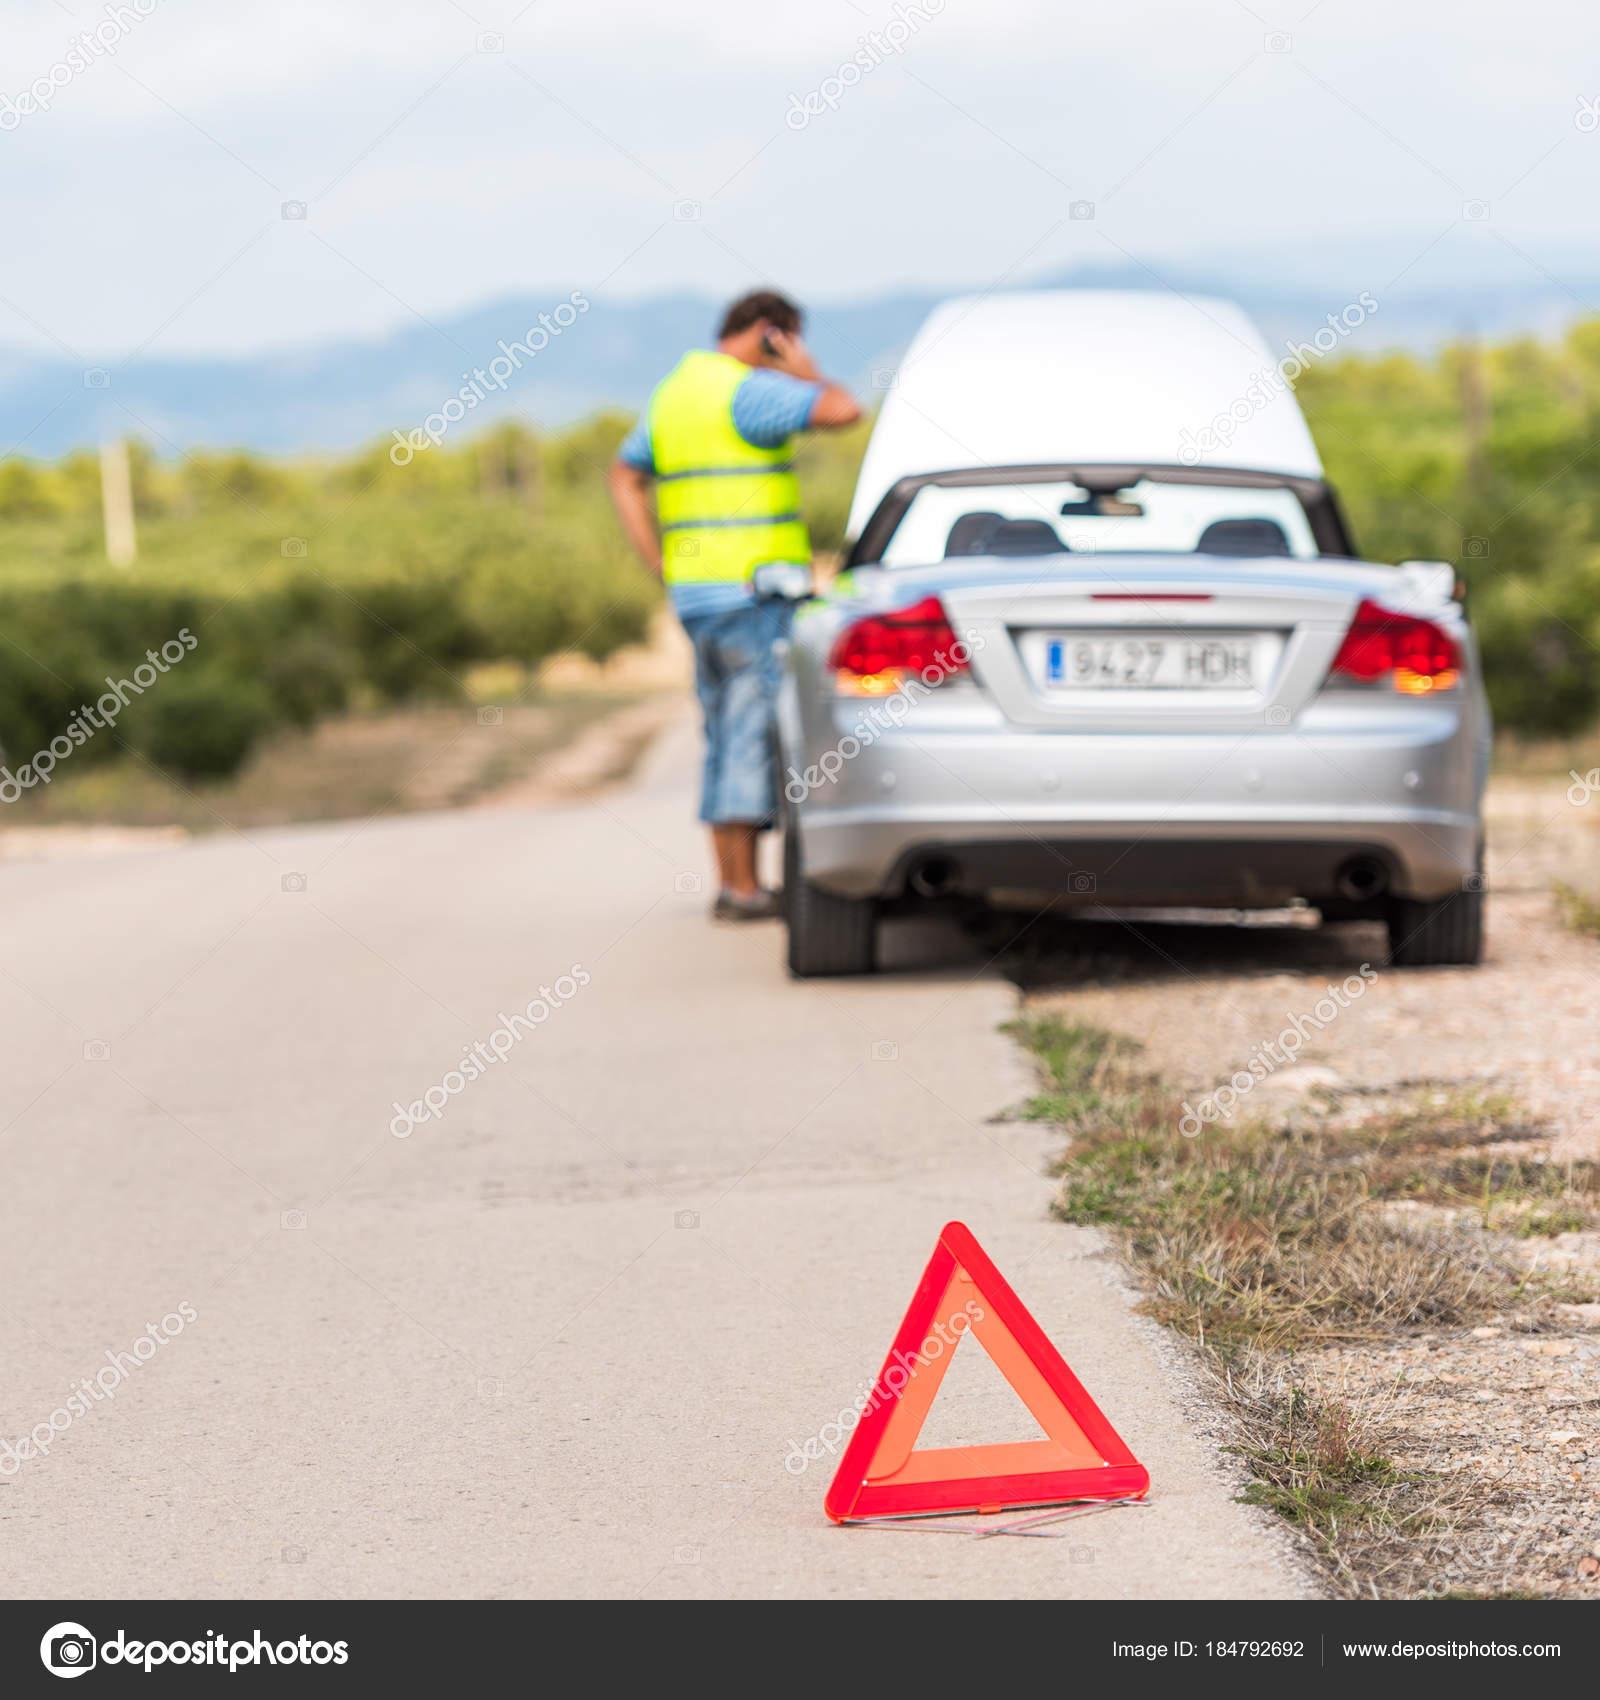 The Spanish Landscape The Car Broke Down On The Road Tarragona